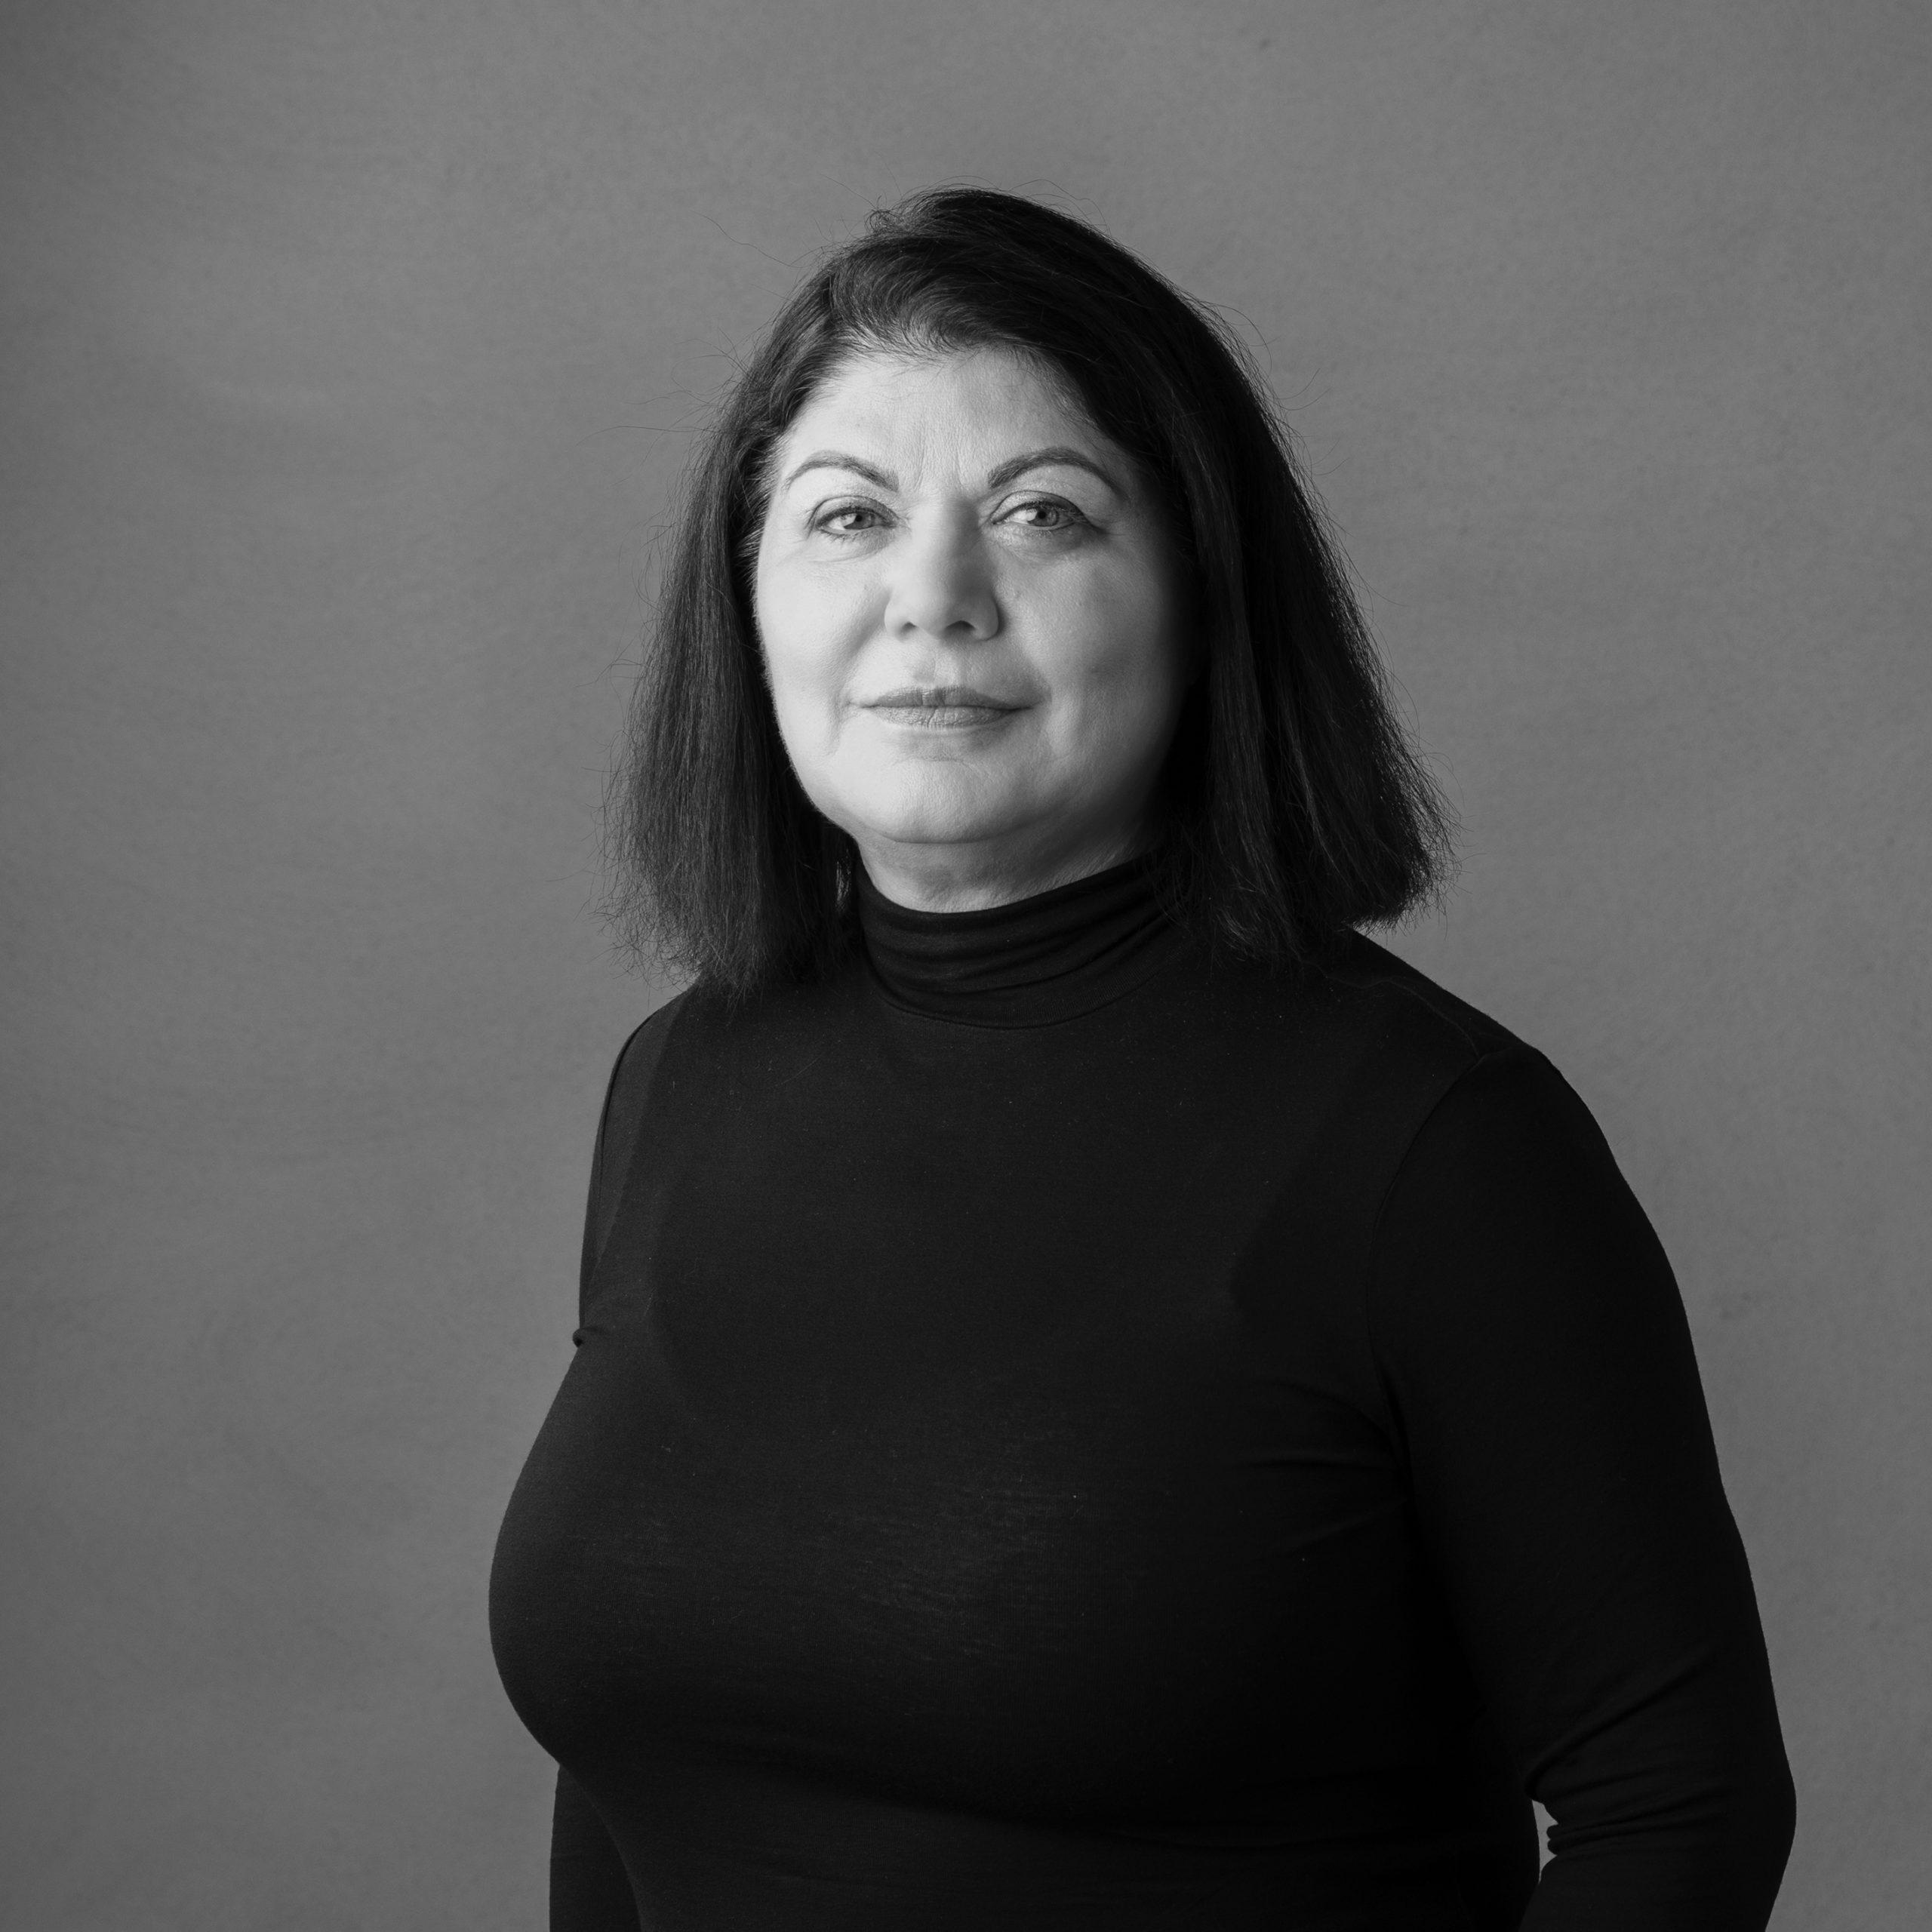 Liliana Jörstad